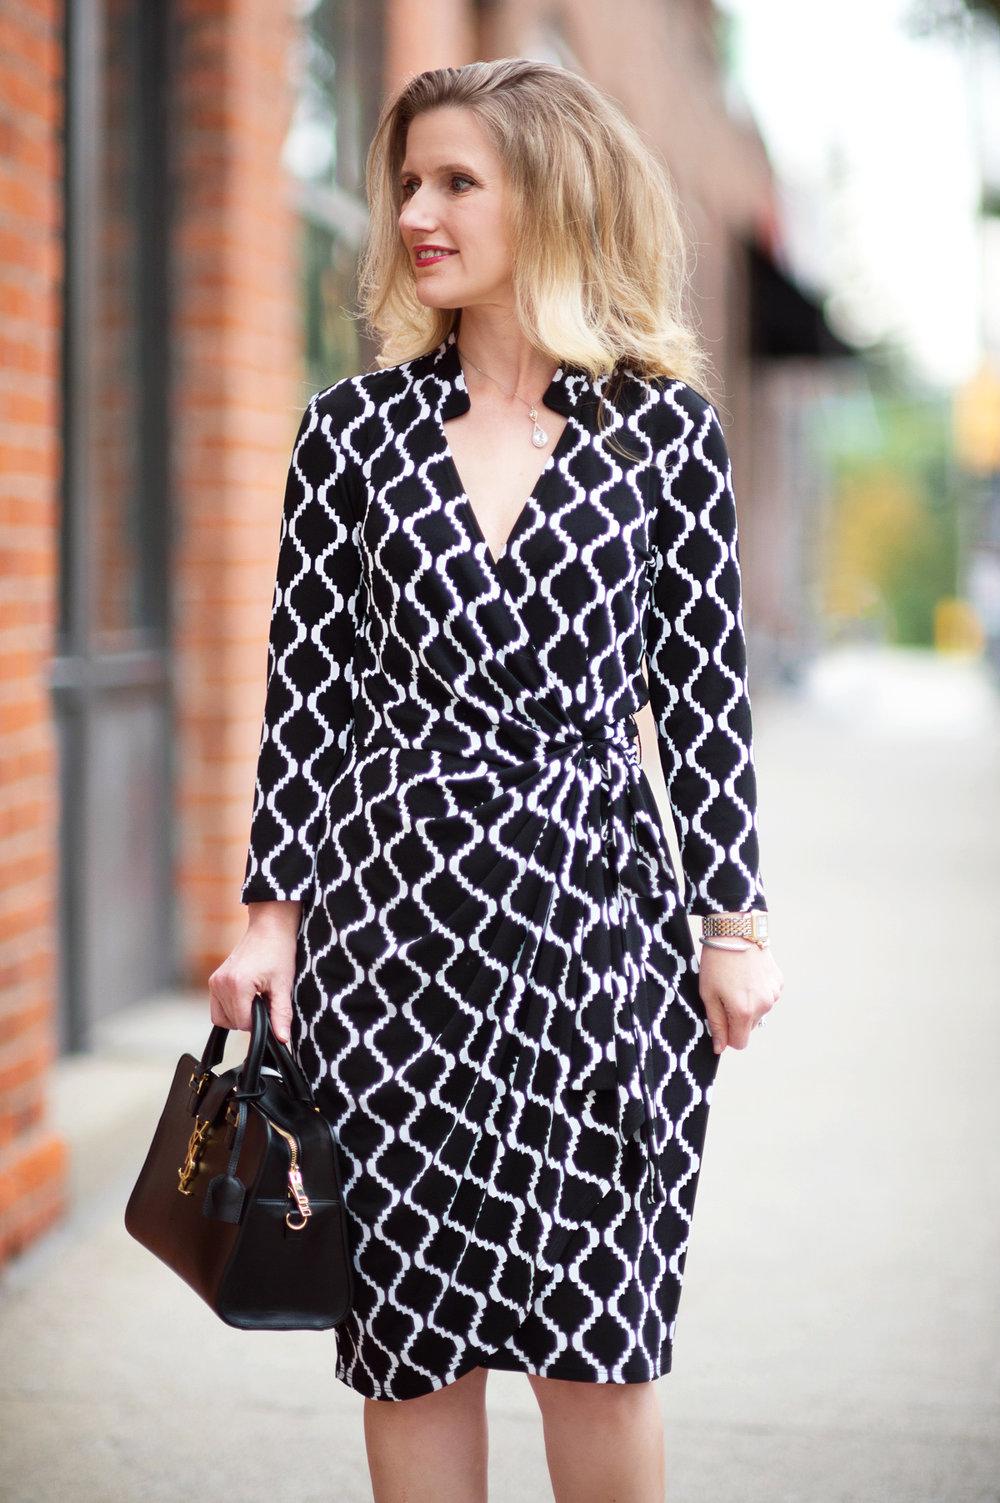 Petite-Fashion-and-Style-Blog---Maggy-London-Philomena-Dress-7.jpg